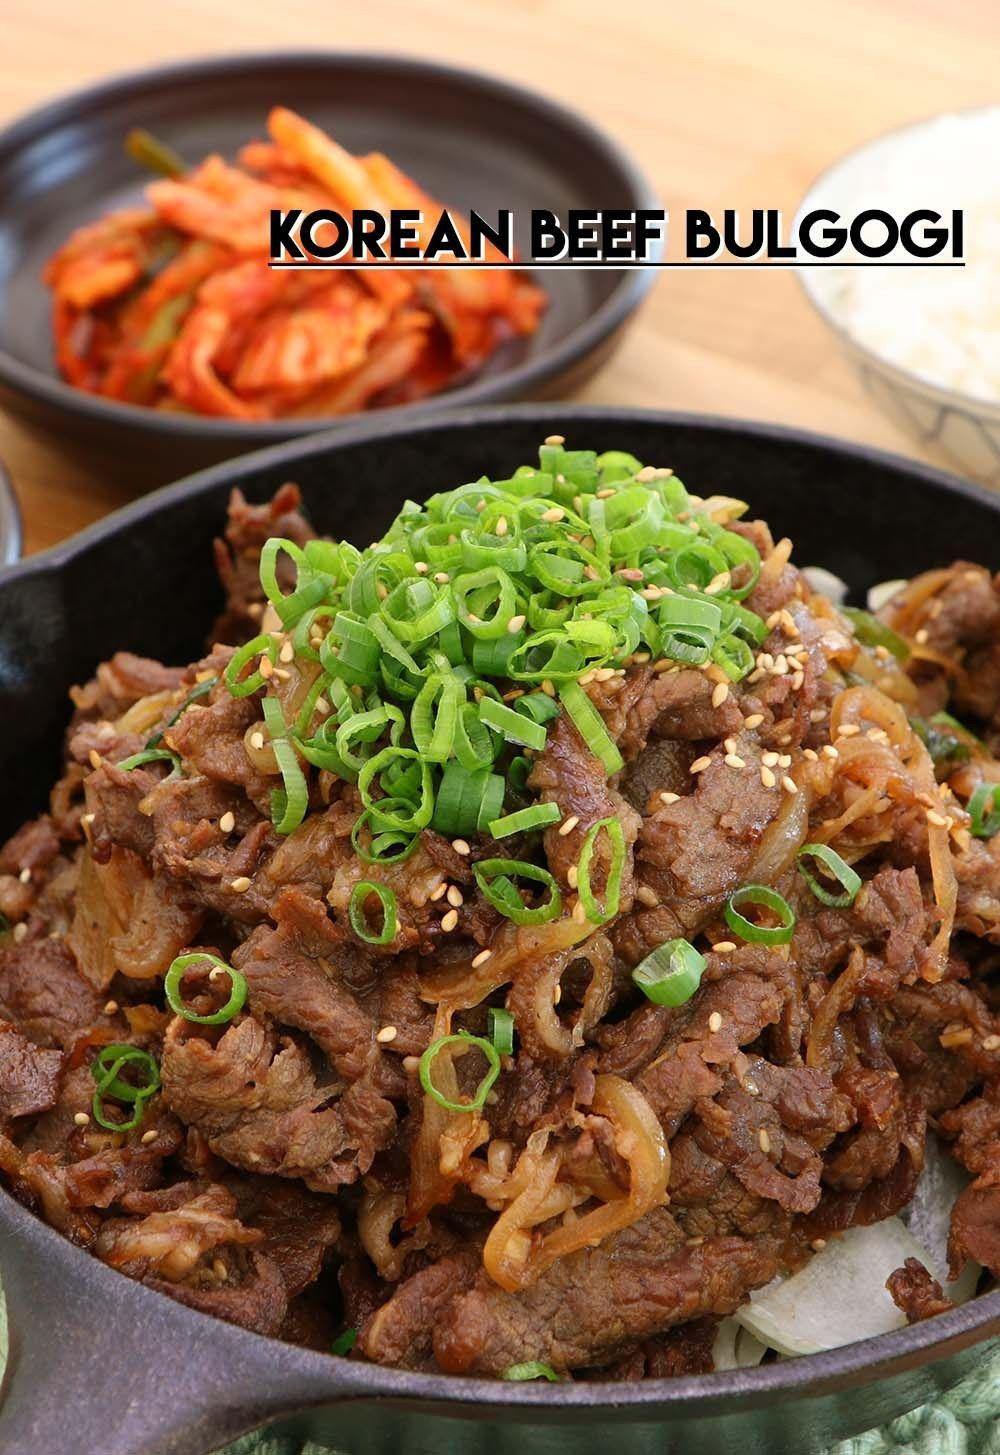 Beef Bulgogi Recipe Video Seonkyoung Longest Recipe Bulgogi Recipe Bulgogi Beef Beef Bulgogi Recipe